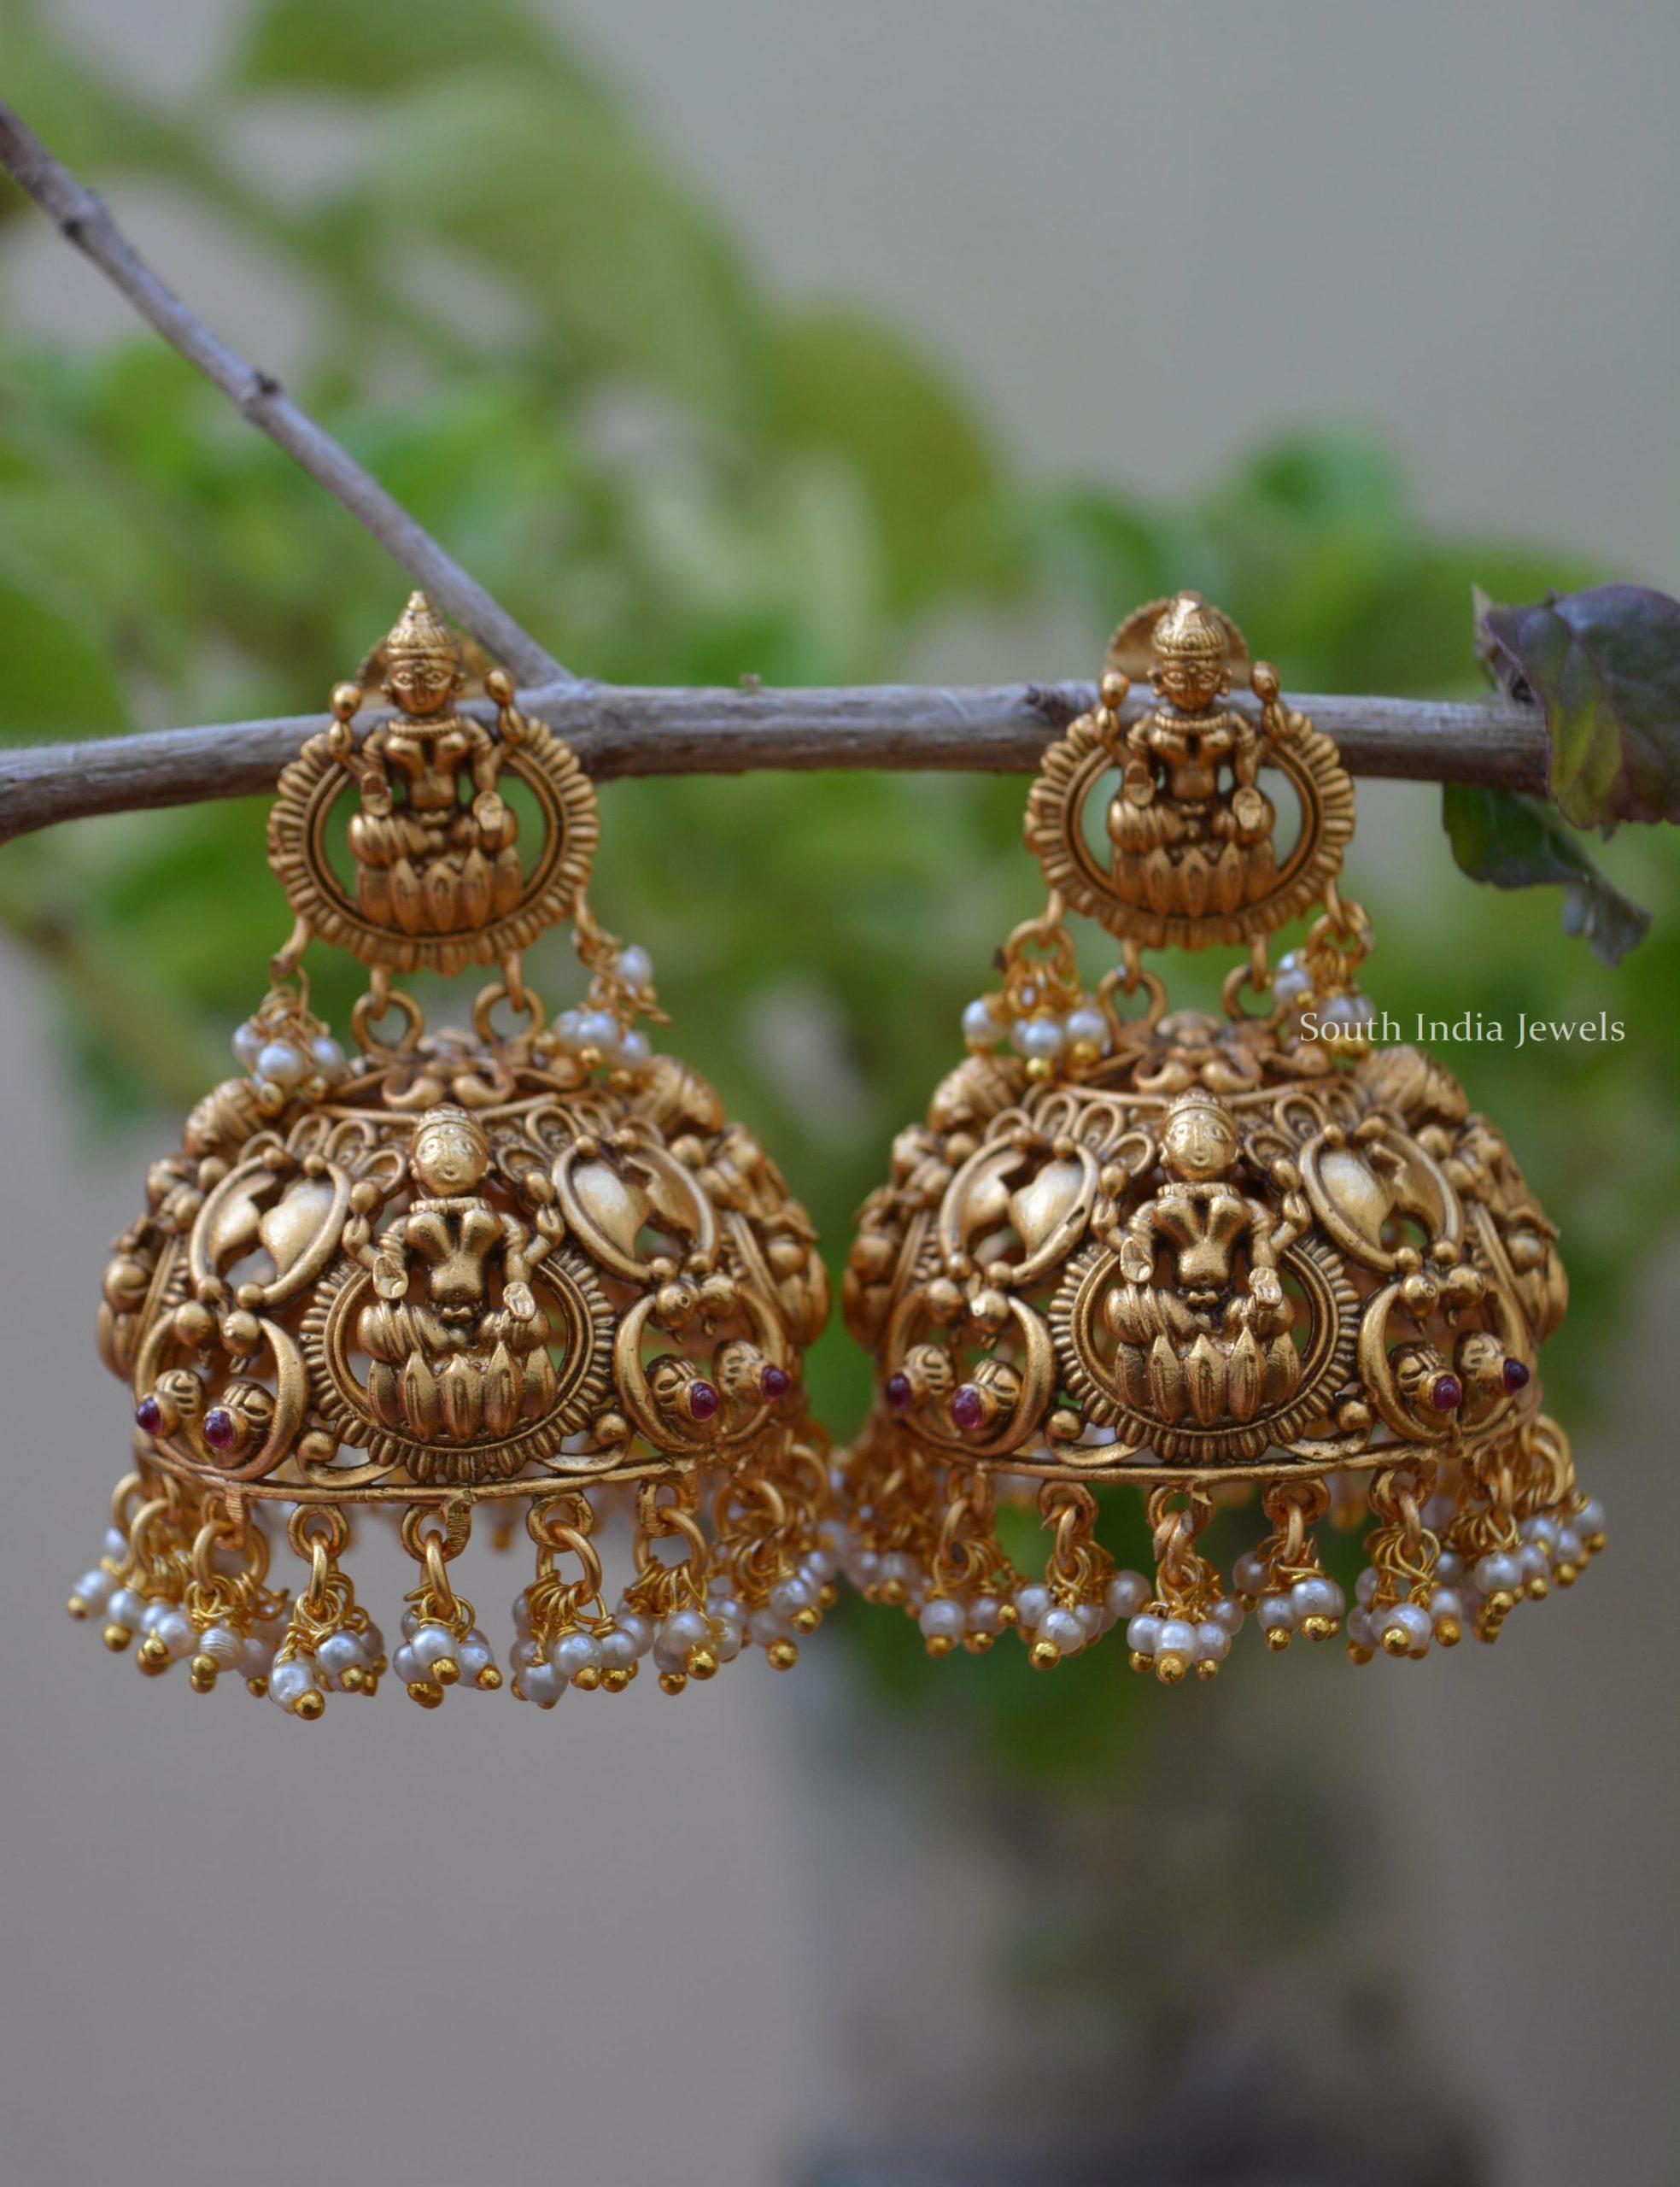 Grand-Imitation-Lakshmi-Jhumka-01-scaled